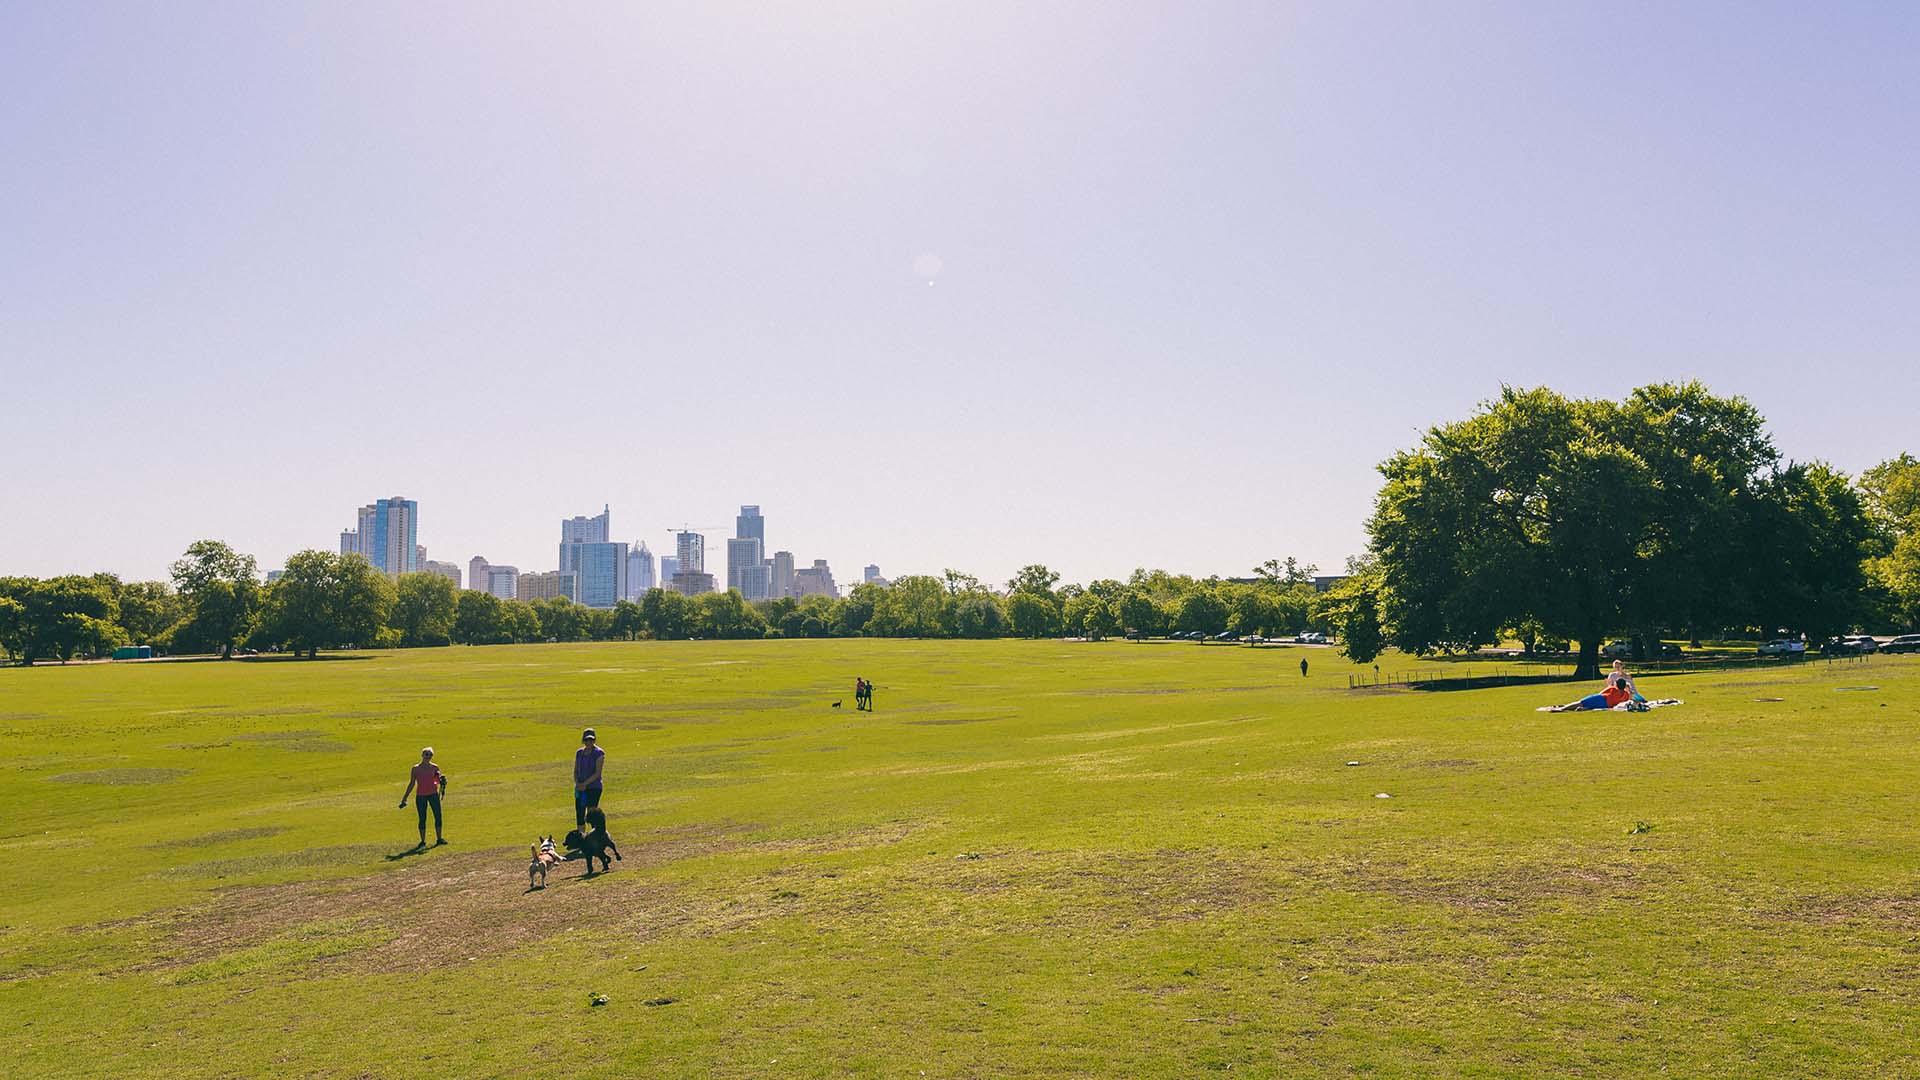 Image of Zilker Park with Austin skyline